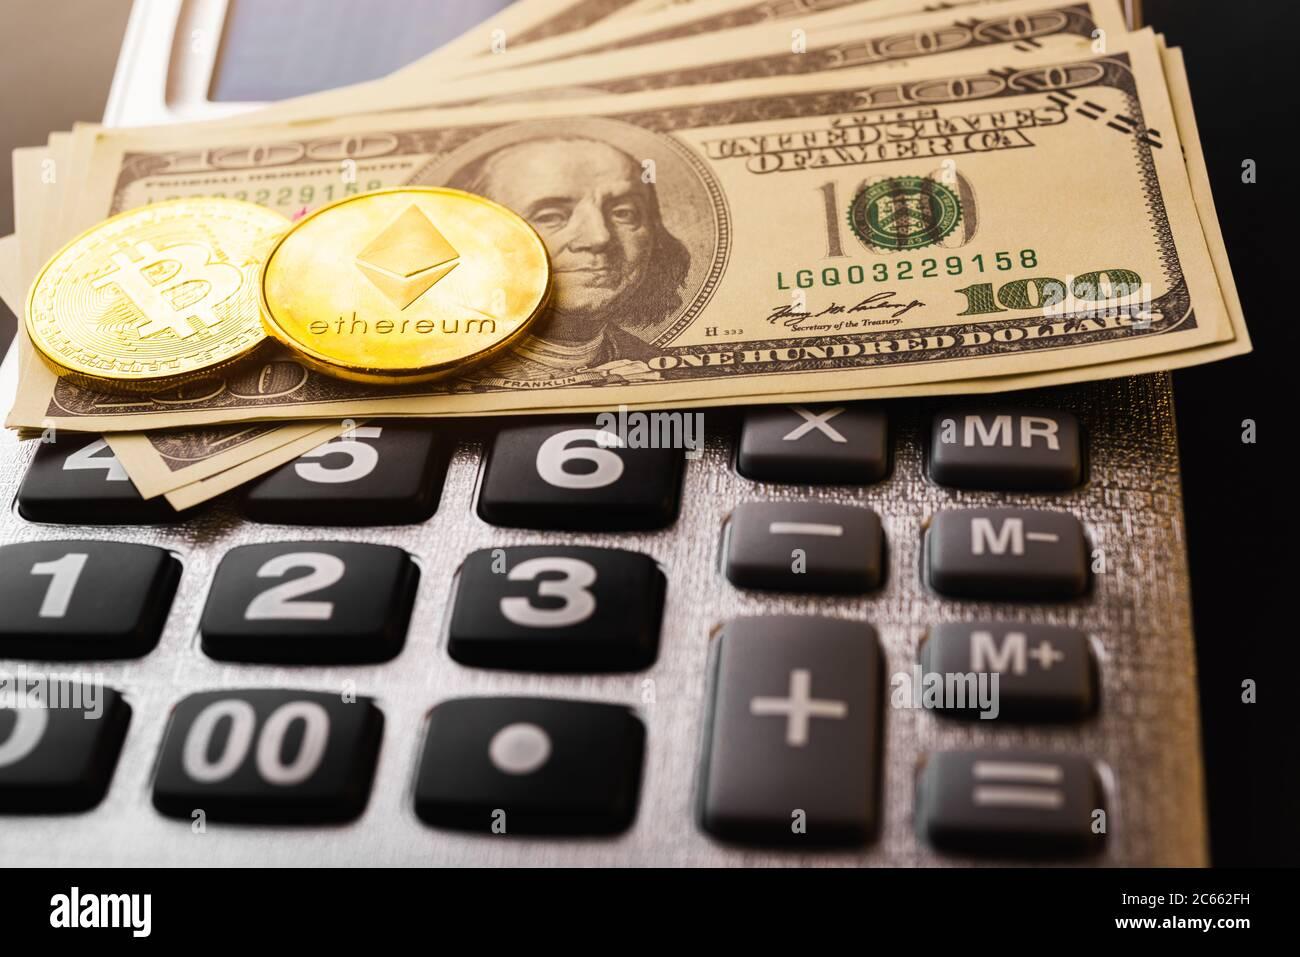 Ethereum crypto currency calculator diomidis nicosia betting